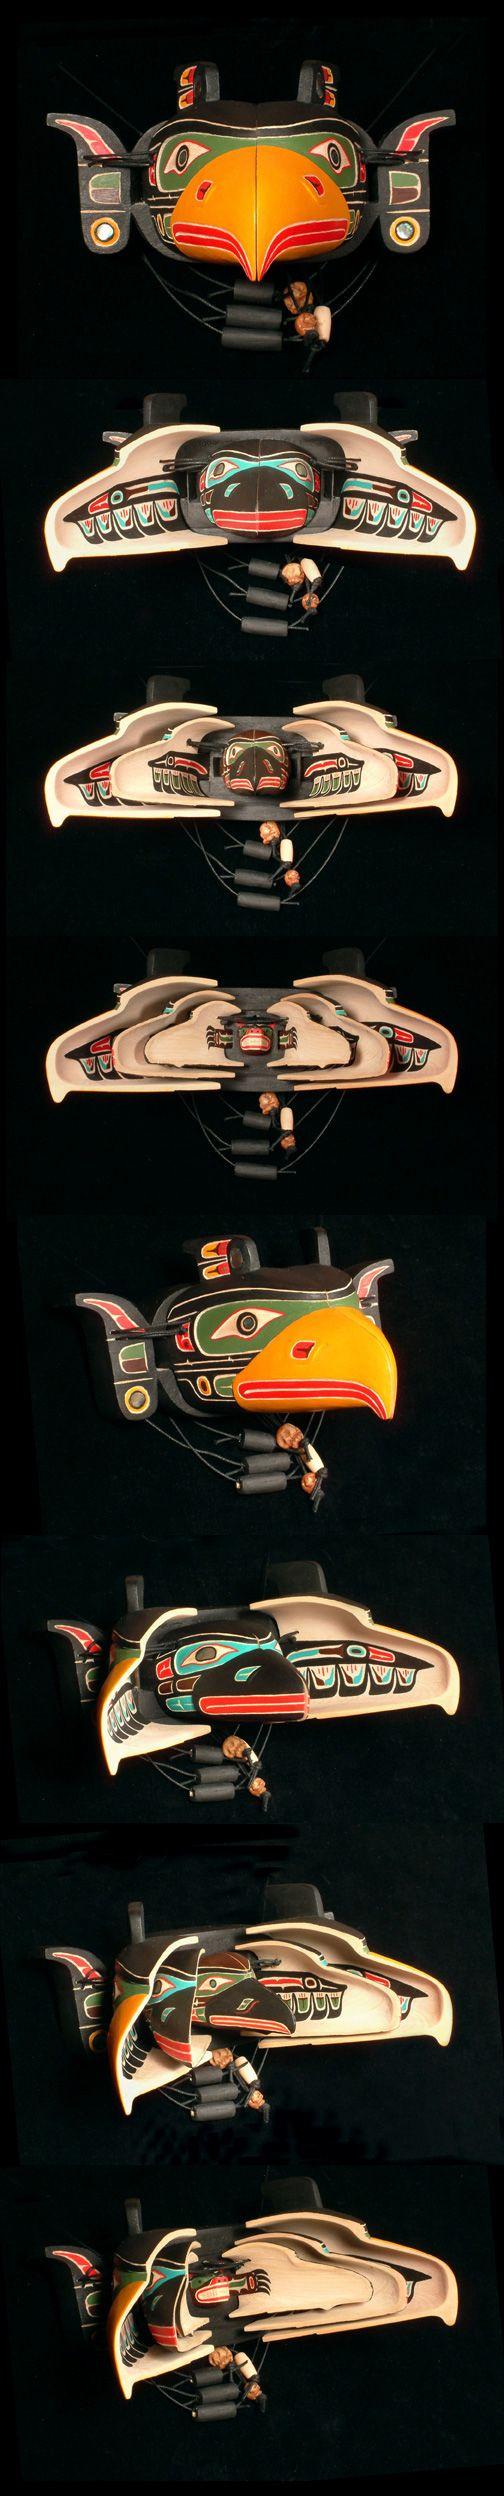 Silas Coon ( Kwakwaka'wakw )  - Four Way Miniature Transformation Mask featuring Kulus, Cormorant, Kingfisher and Bear